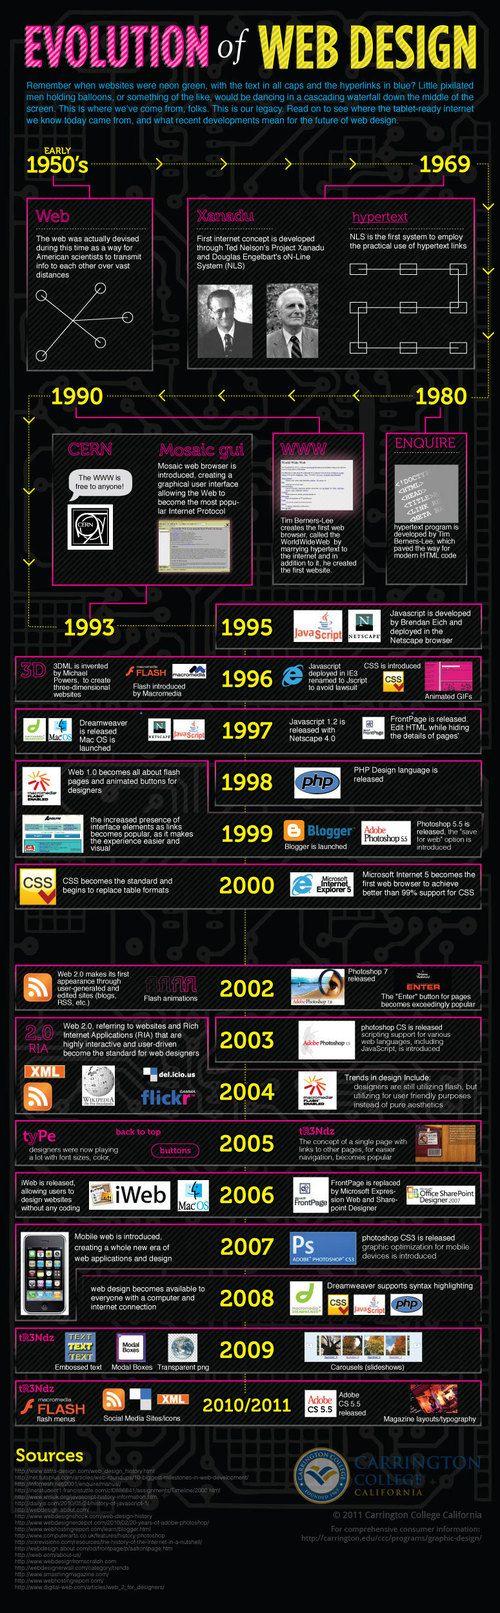 Evolution of Web Design [Infographic]